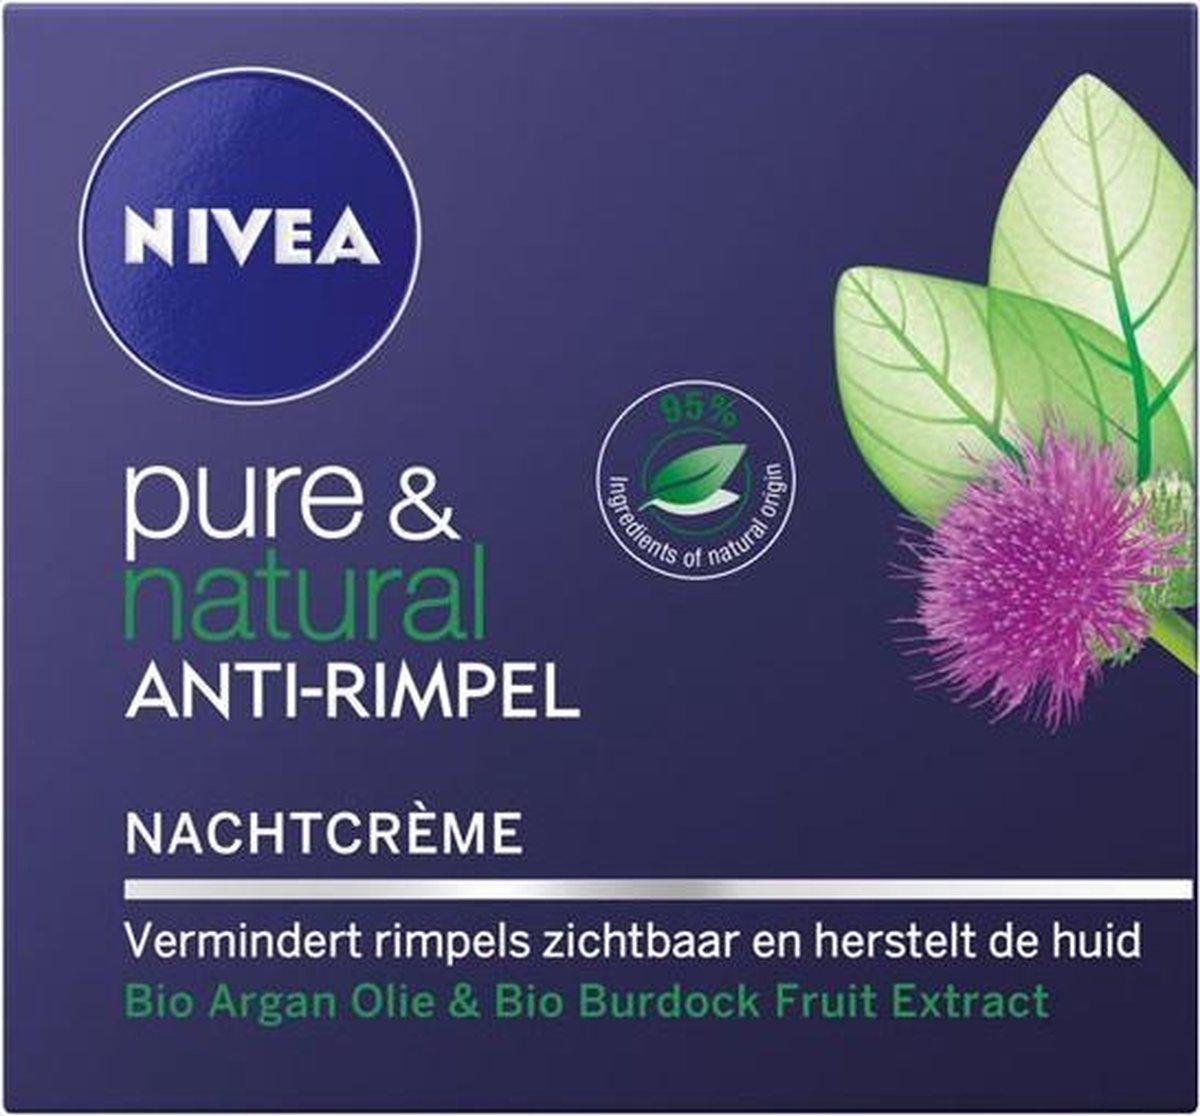 NIVEA Pure & Natural Anti-Rimpel Nachtcrème - 50 ml - NIVEA